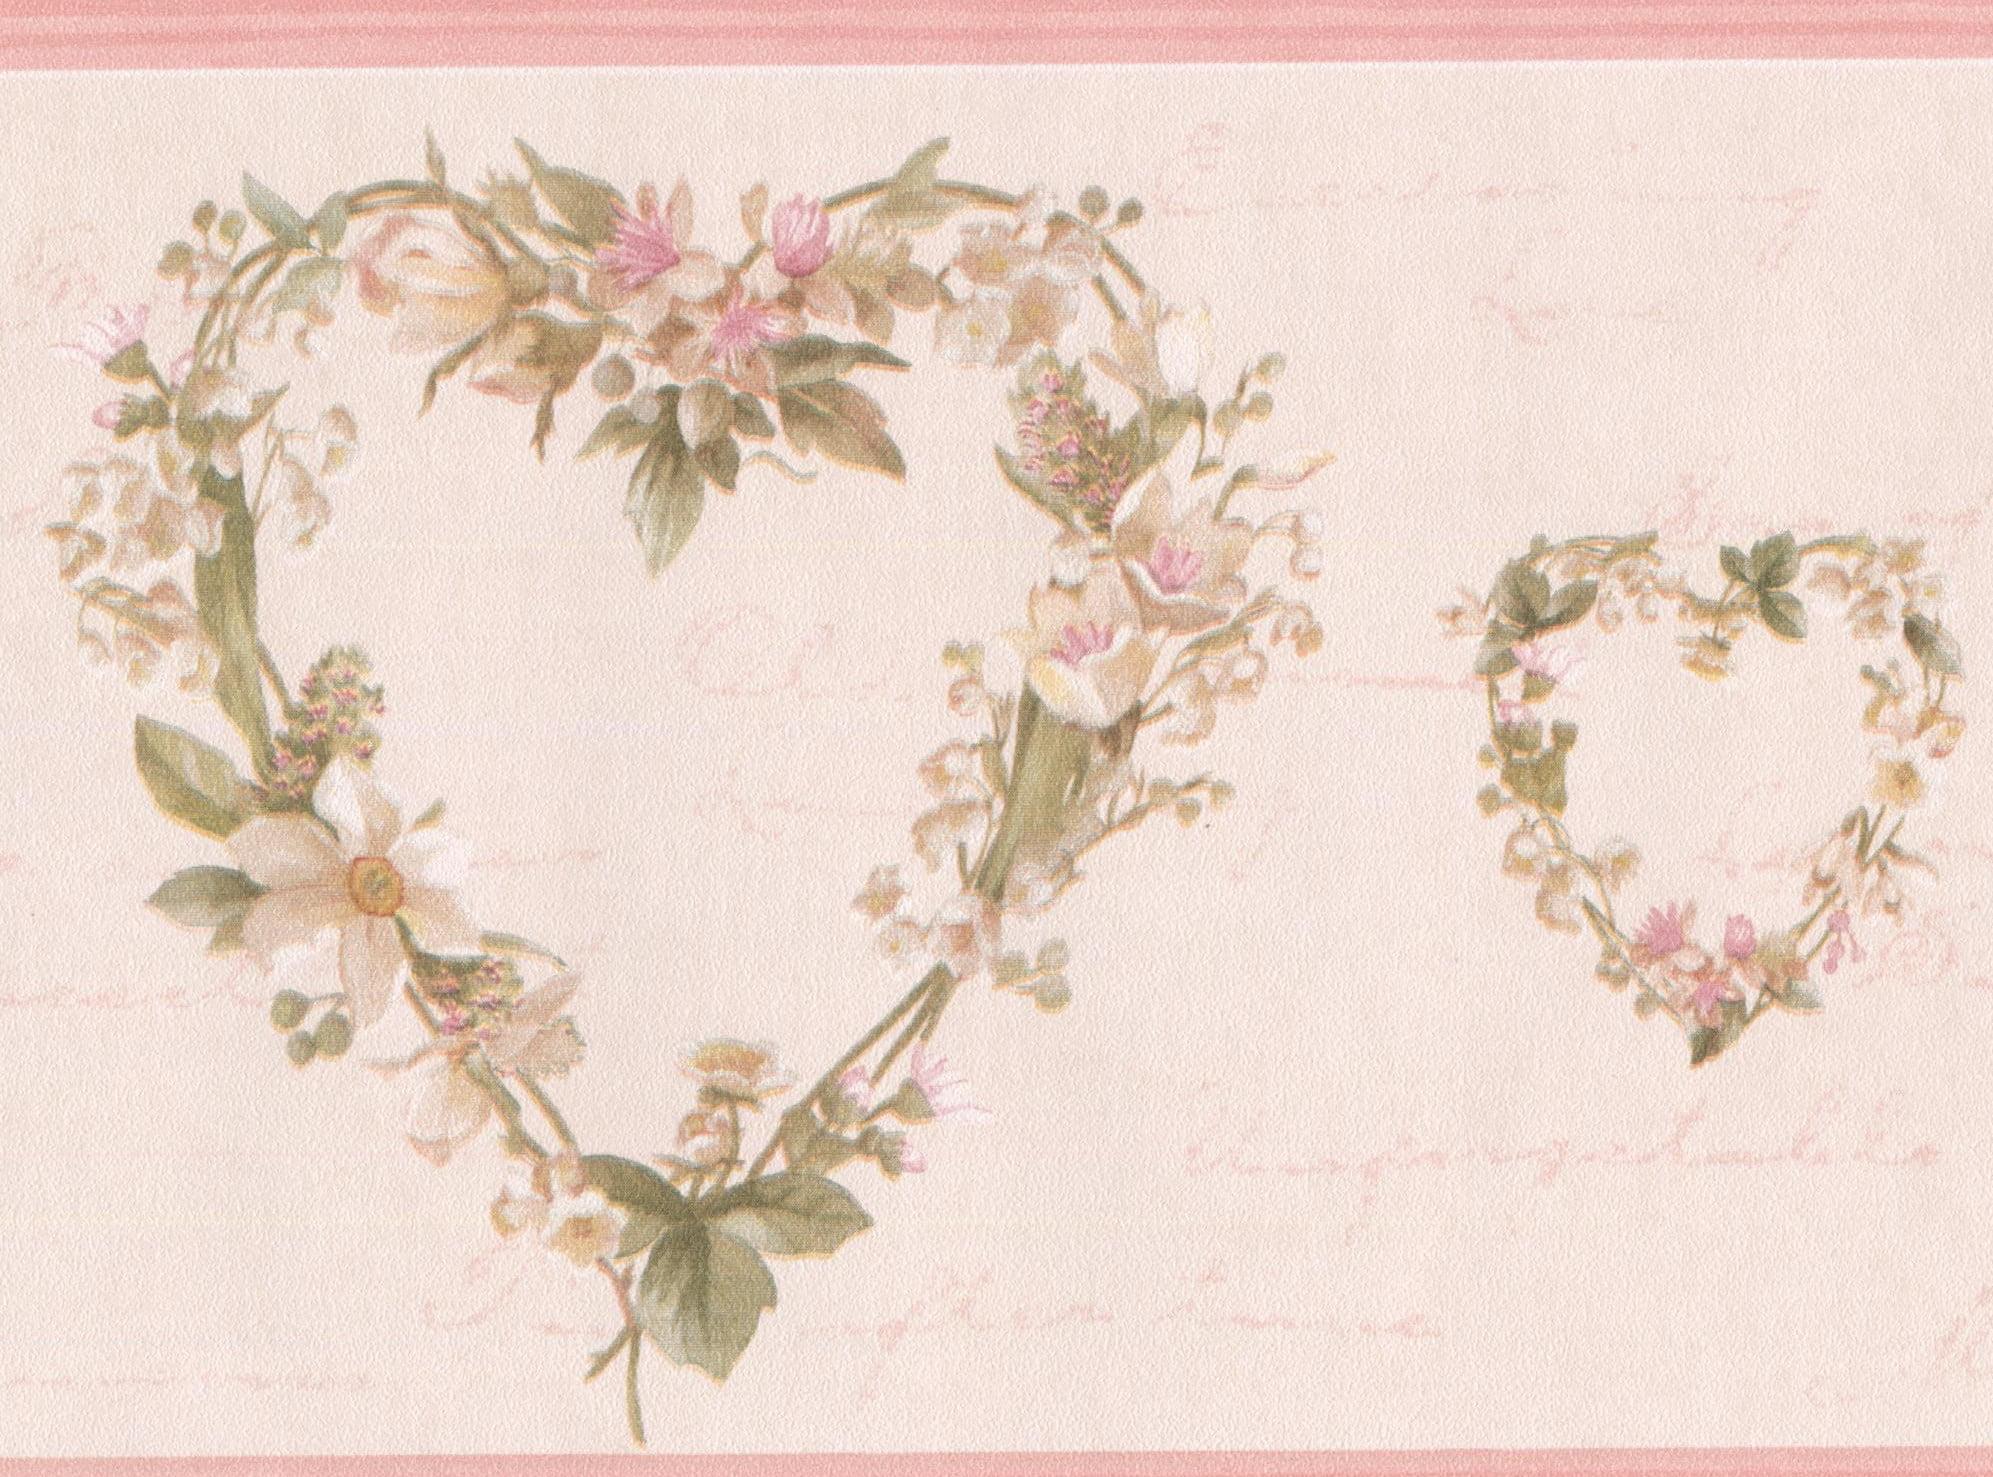 White Flower Wreath Heart Shaped Floral Wallpaper Border Retro